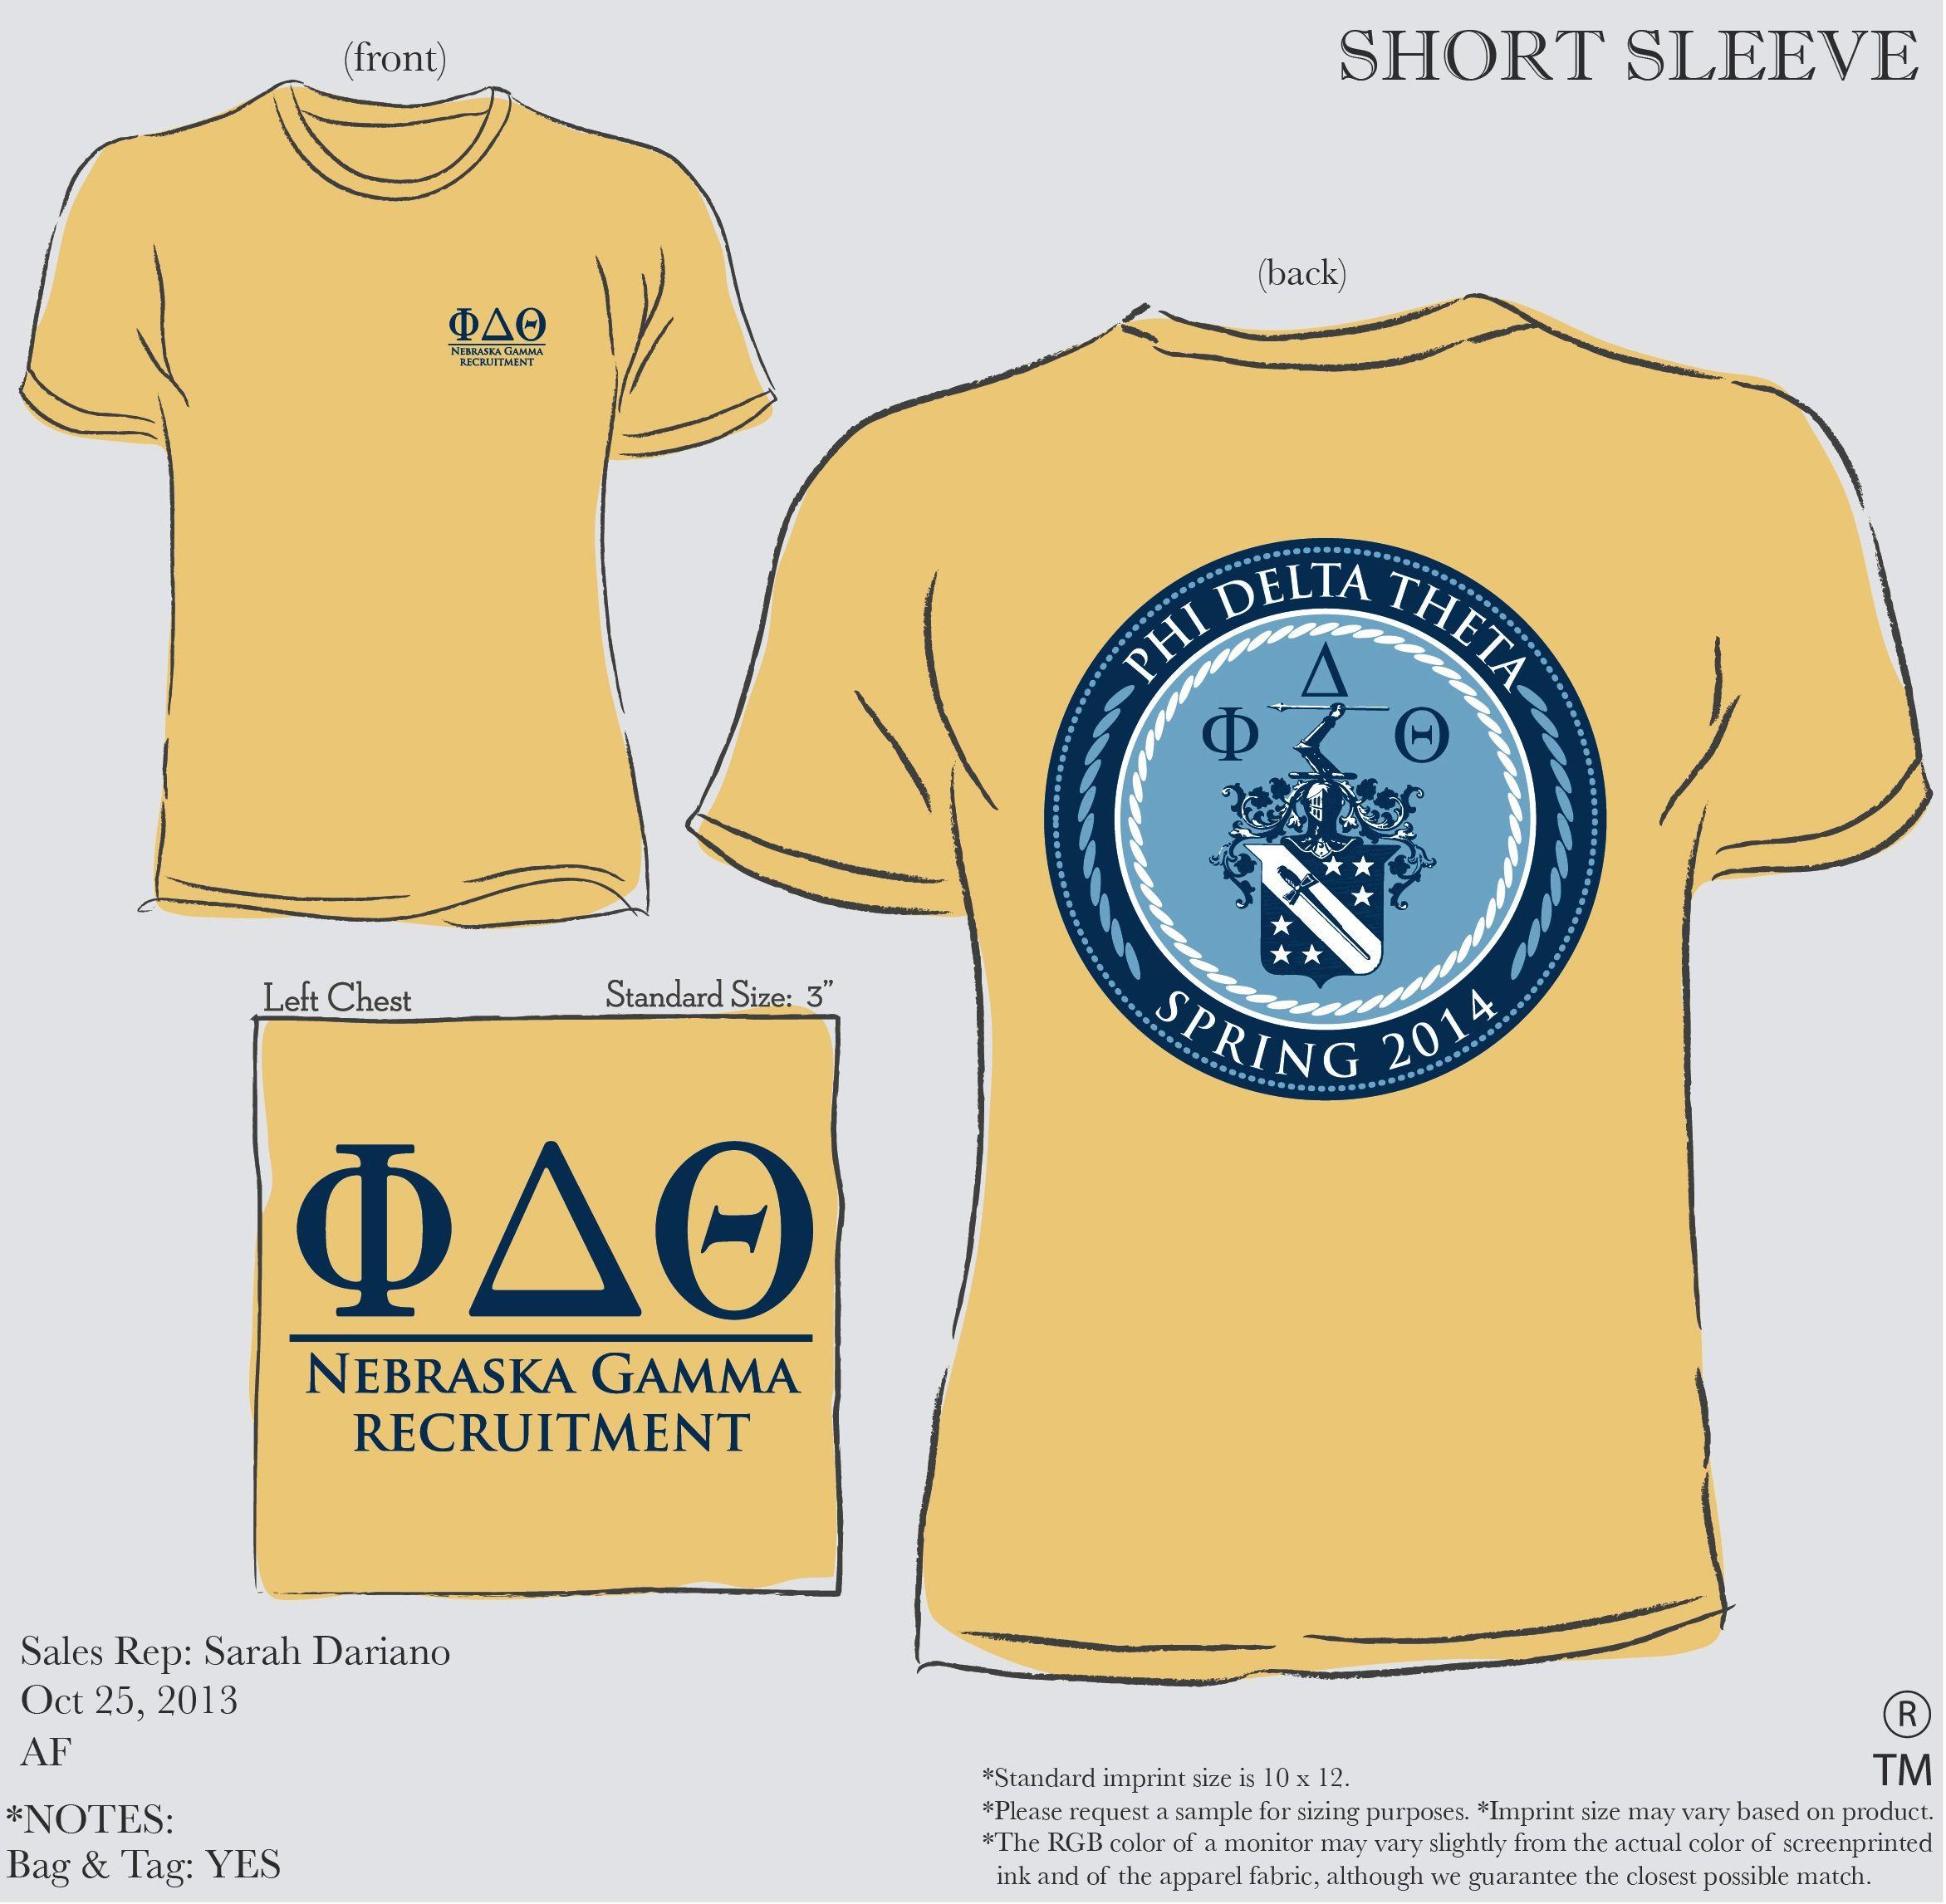 phi delta theta rush shirts #morganrow #geneologie #phideltatheta